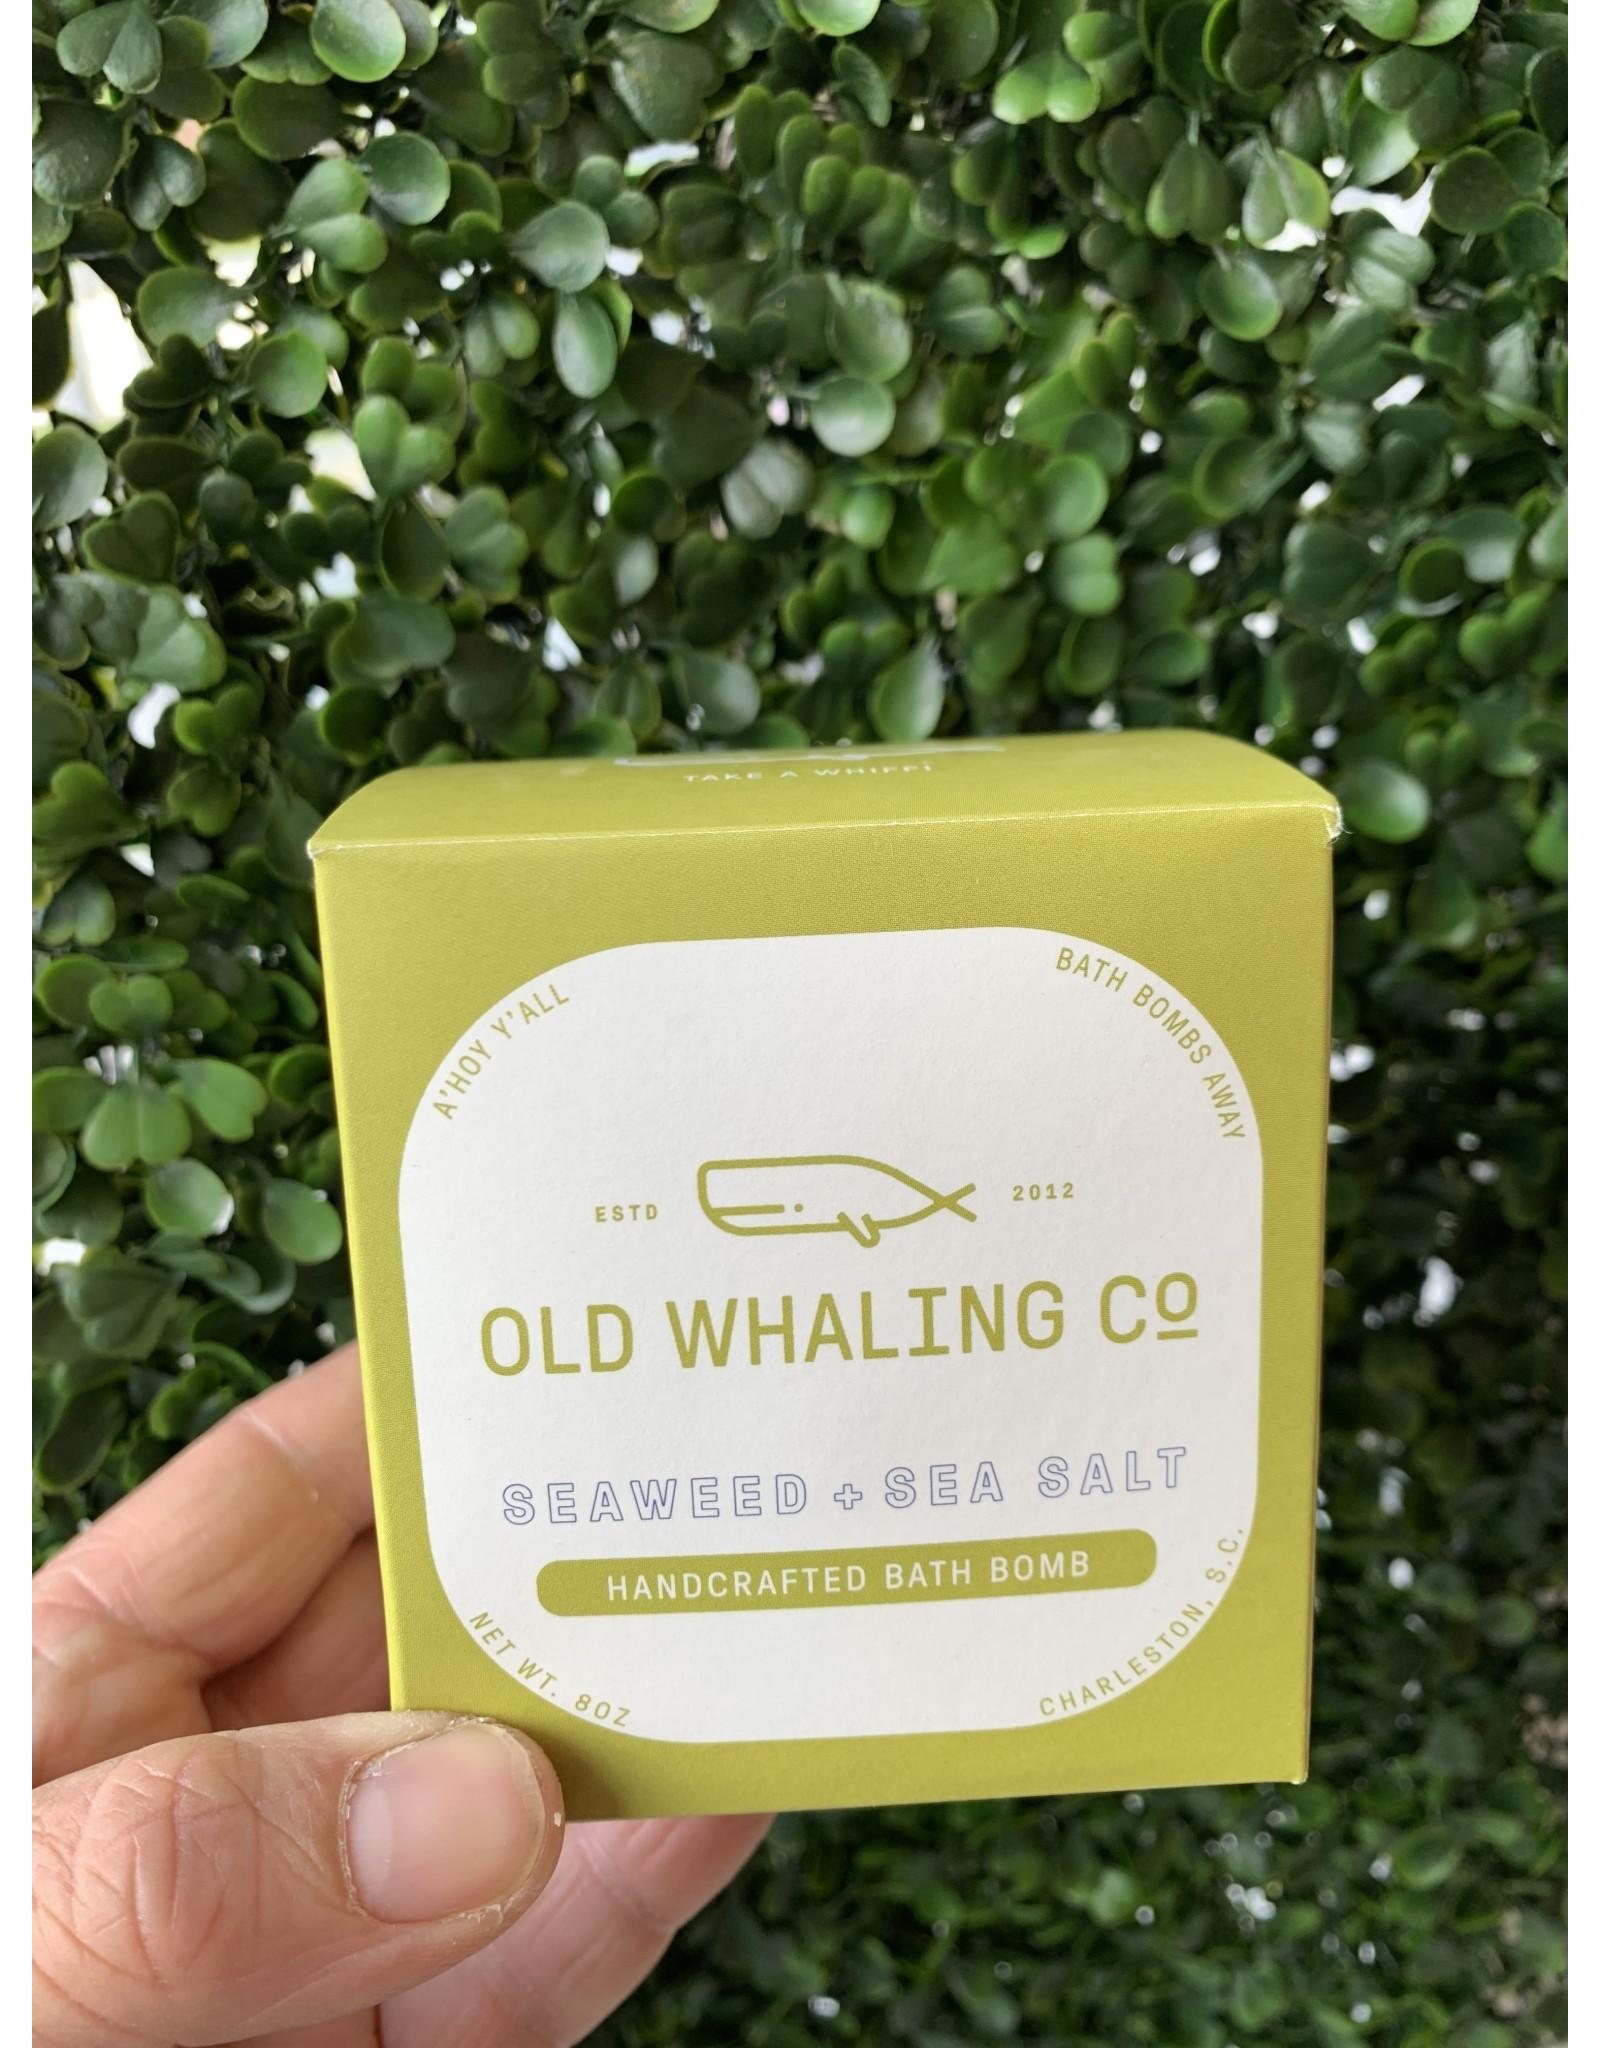 Old Whaling Co. Seaweed & Sea Salt 8oz Bath Bomb